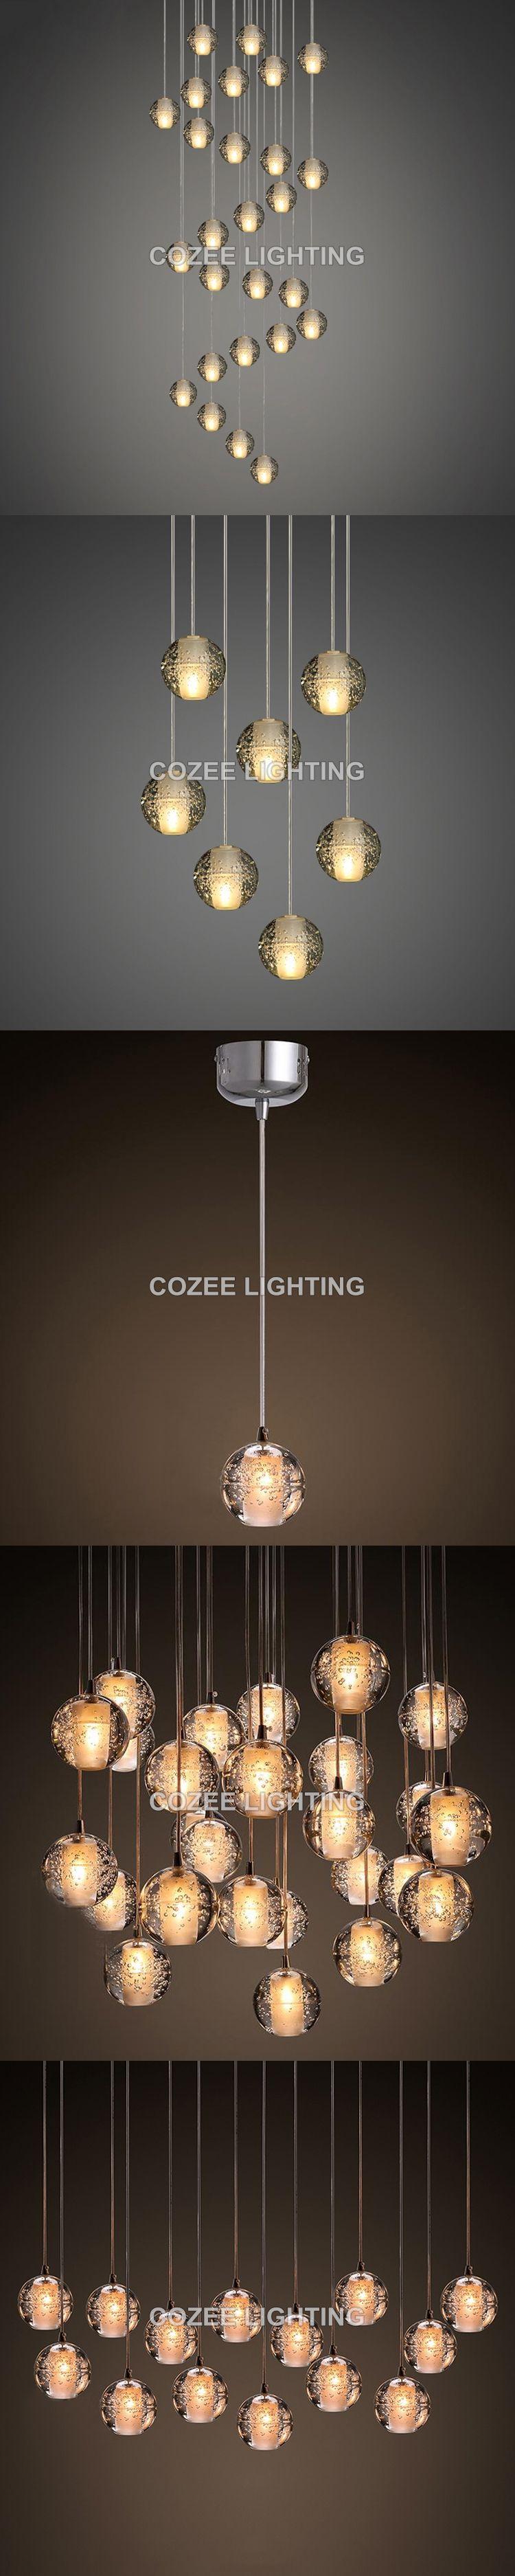 Modern Crystal Chandelier LED Hanging Lighting Glass Globe Orb